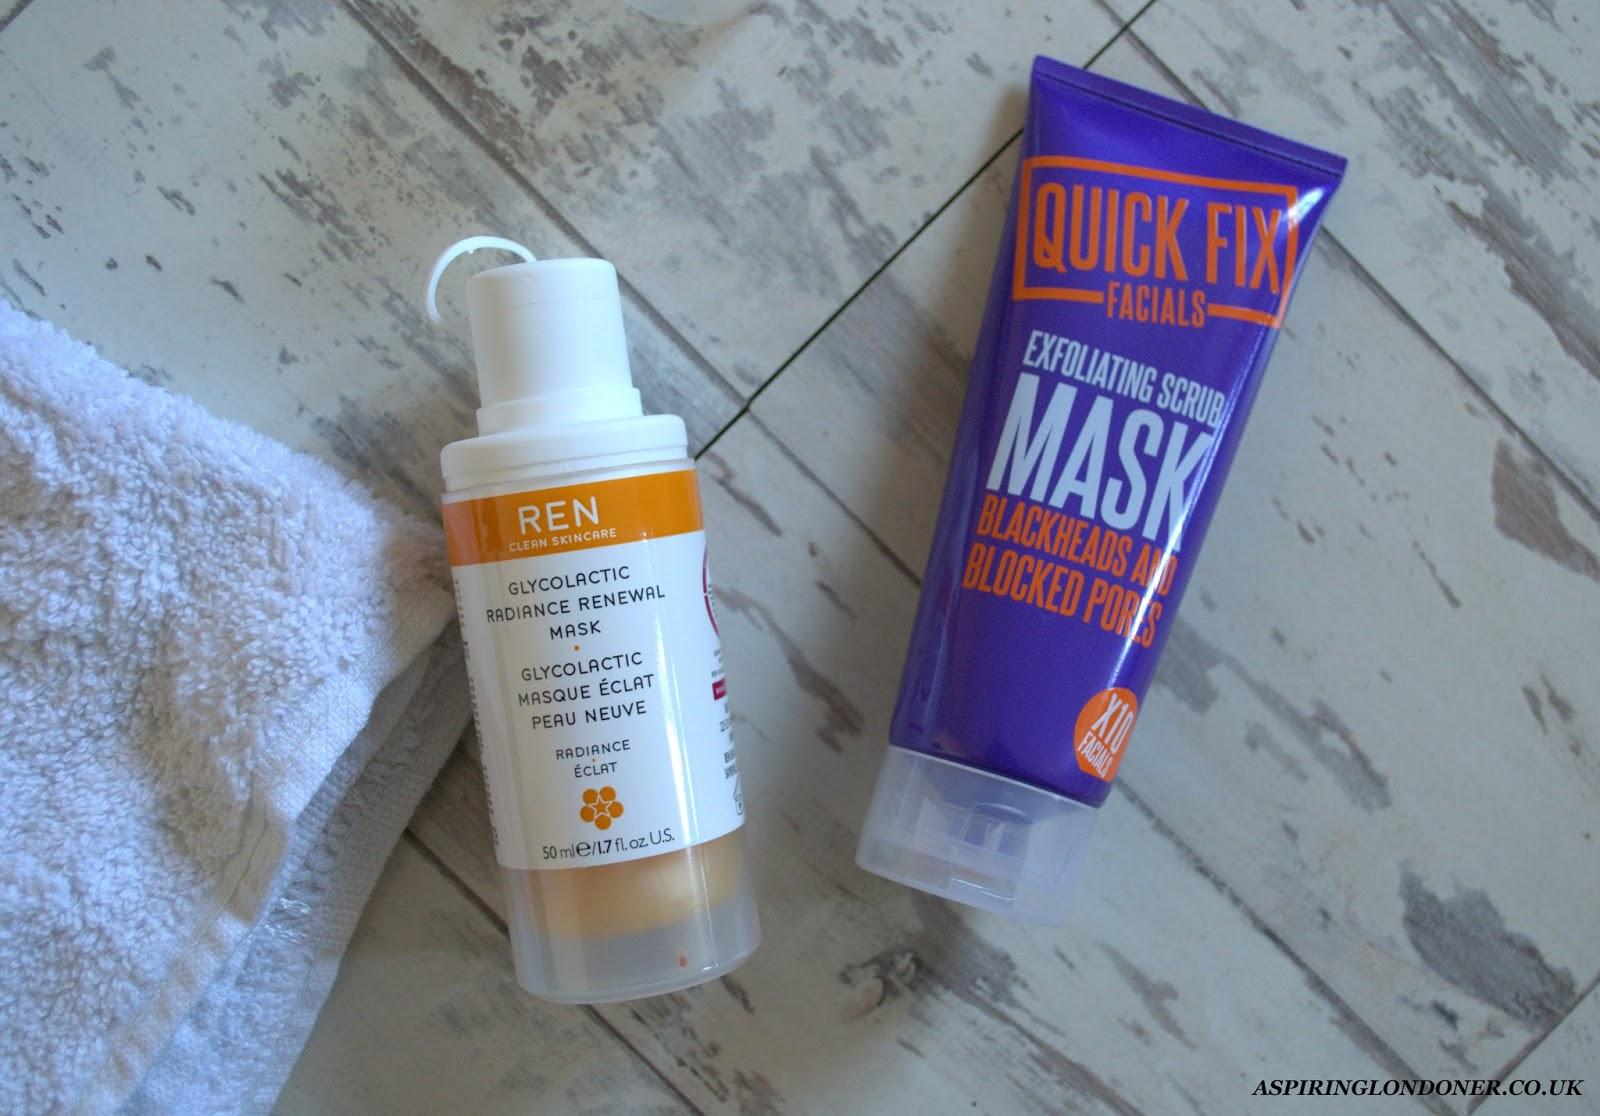 Multi-masking Brightening Masks - Aspiring Londoner